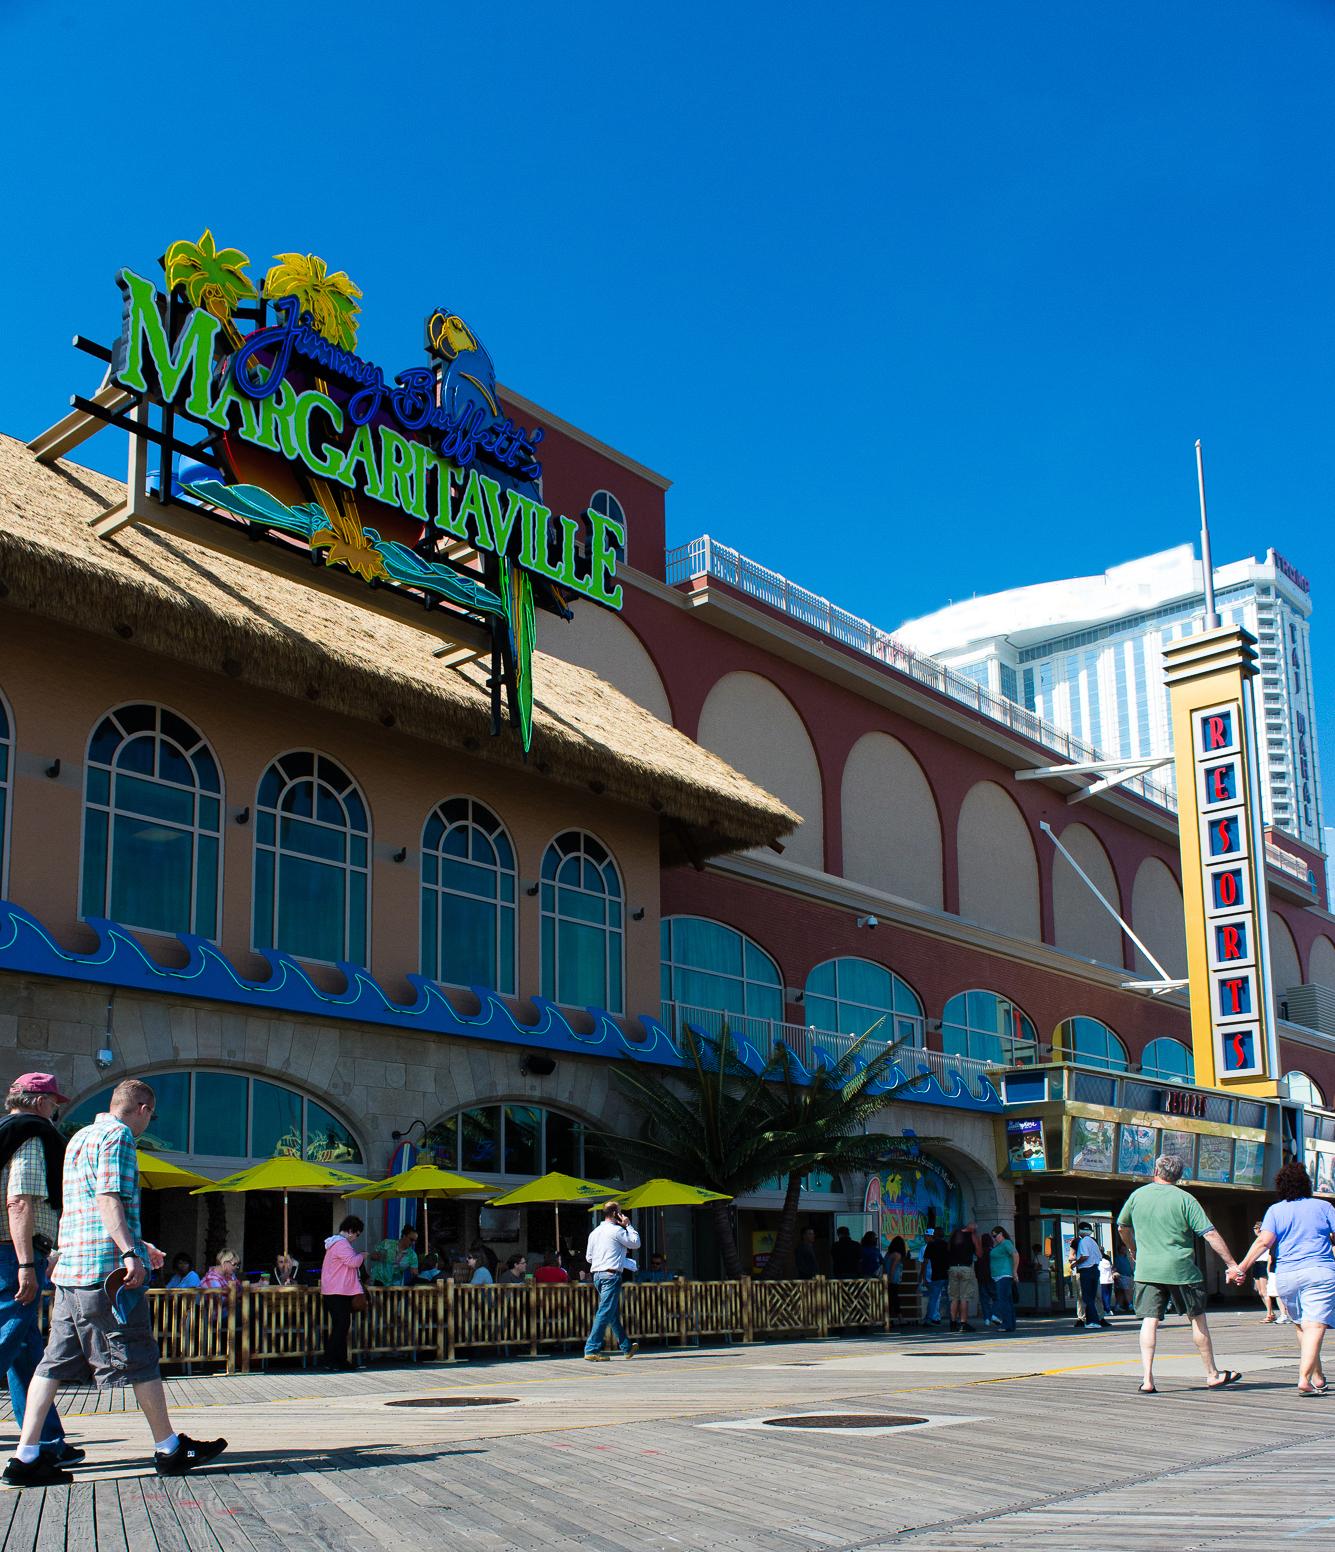 Margaritaville casino atlantic city nj casino no online purchase required